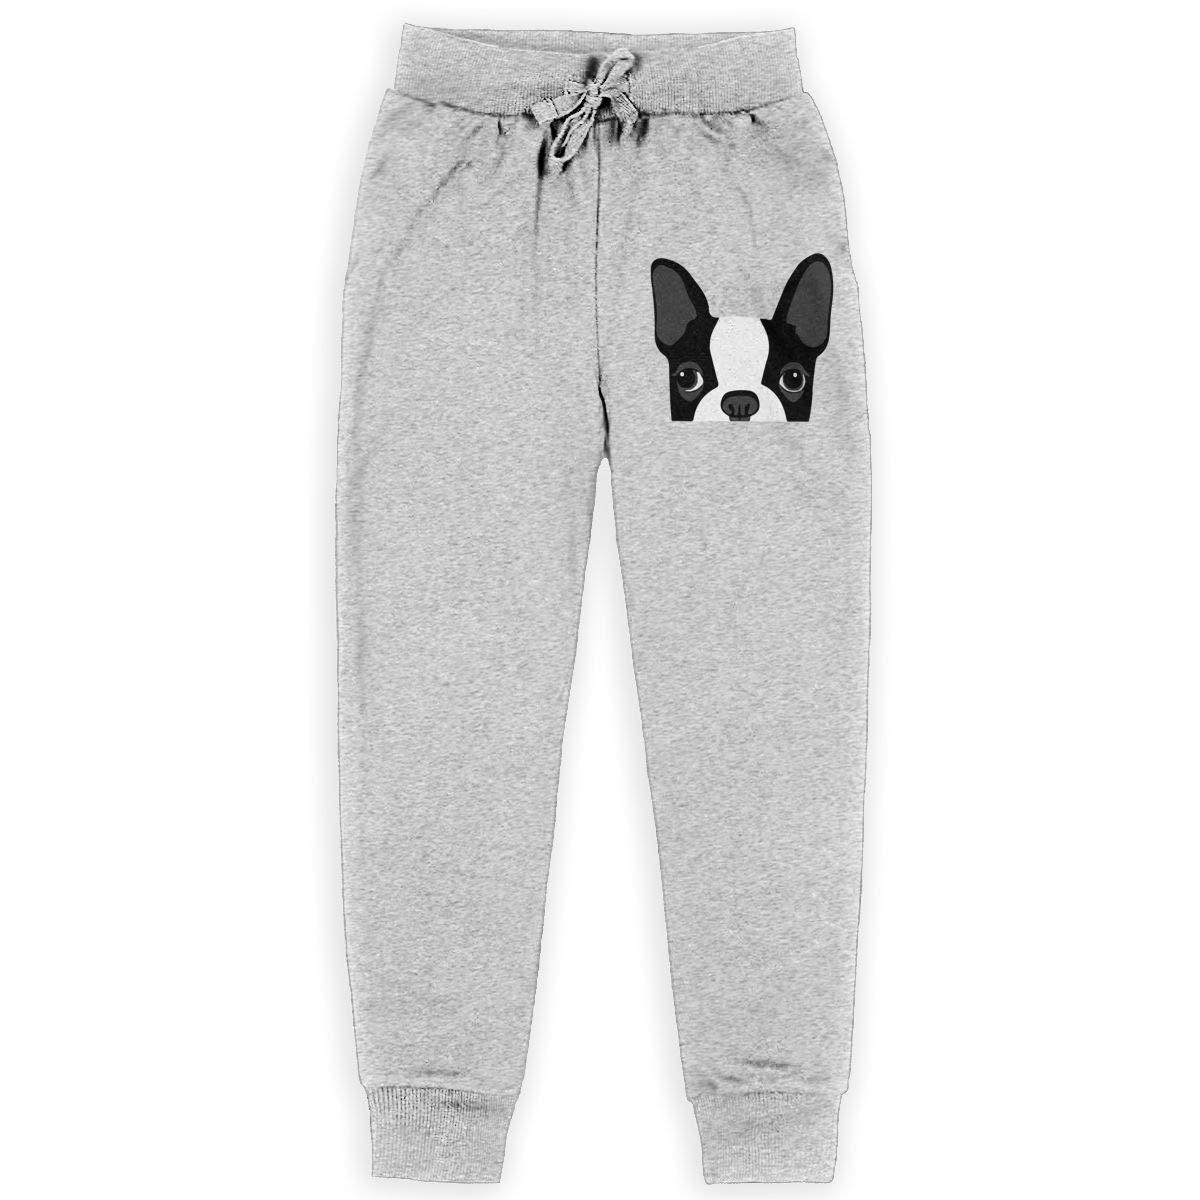 Bing4Bing Dog Face Boys Cotton Sweatpants Casual Joggers Pants Active Pants